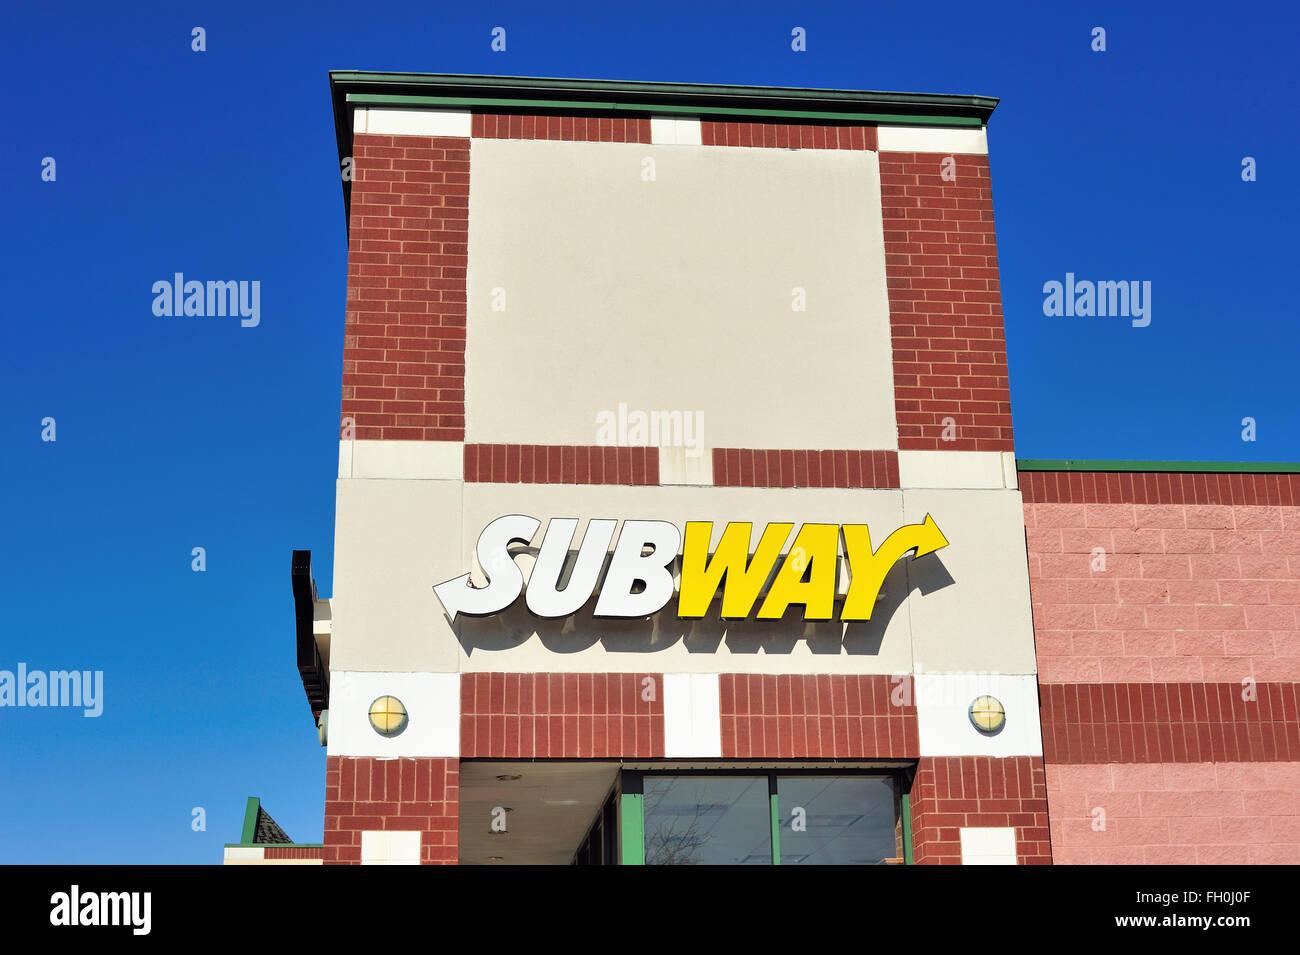 A Subway franchise location in the suburban Chicago community of Elgin, Illinois, USA. - Stock Image